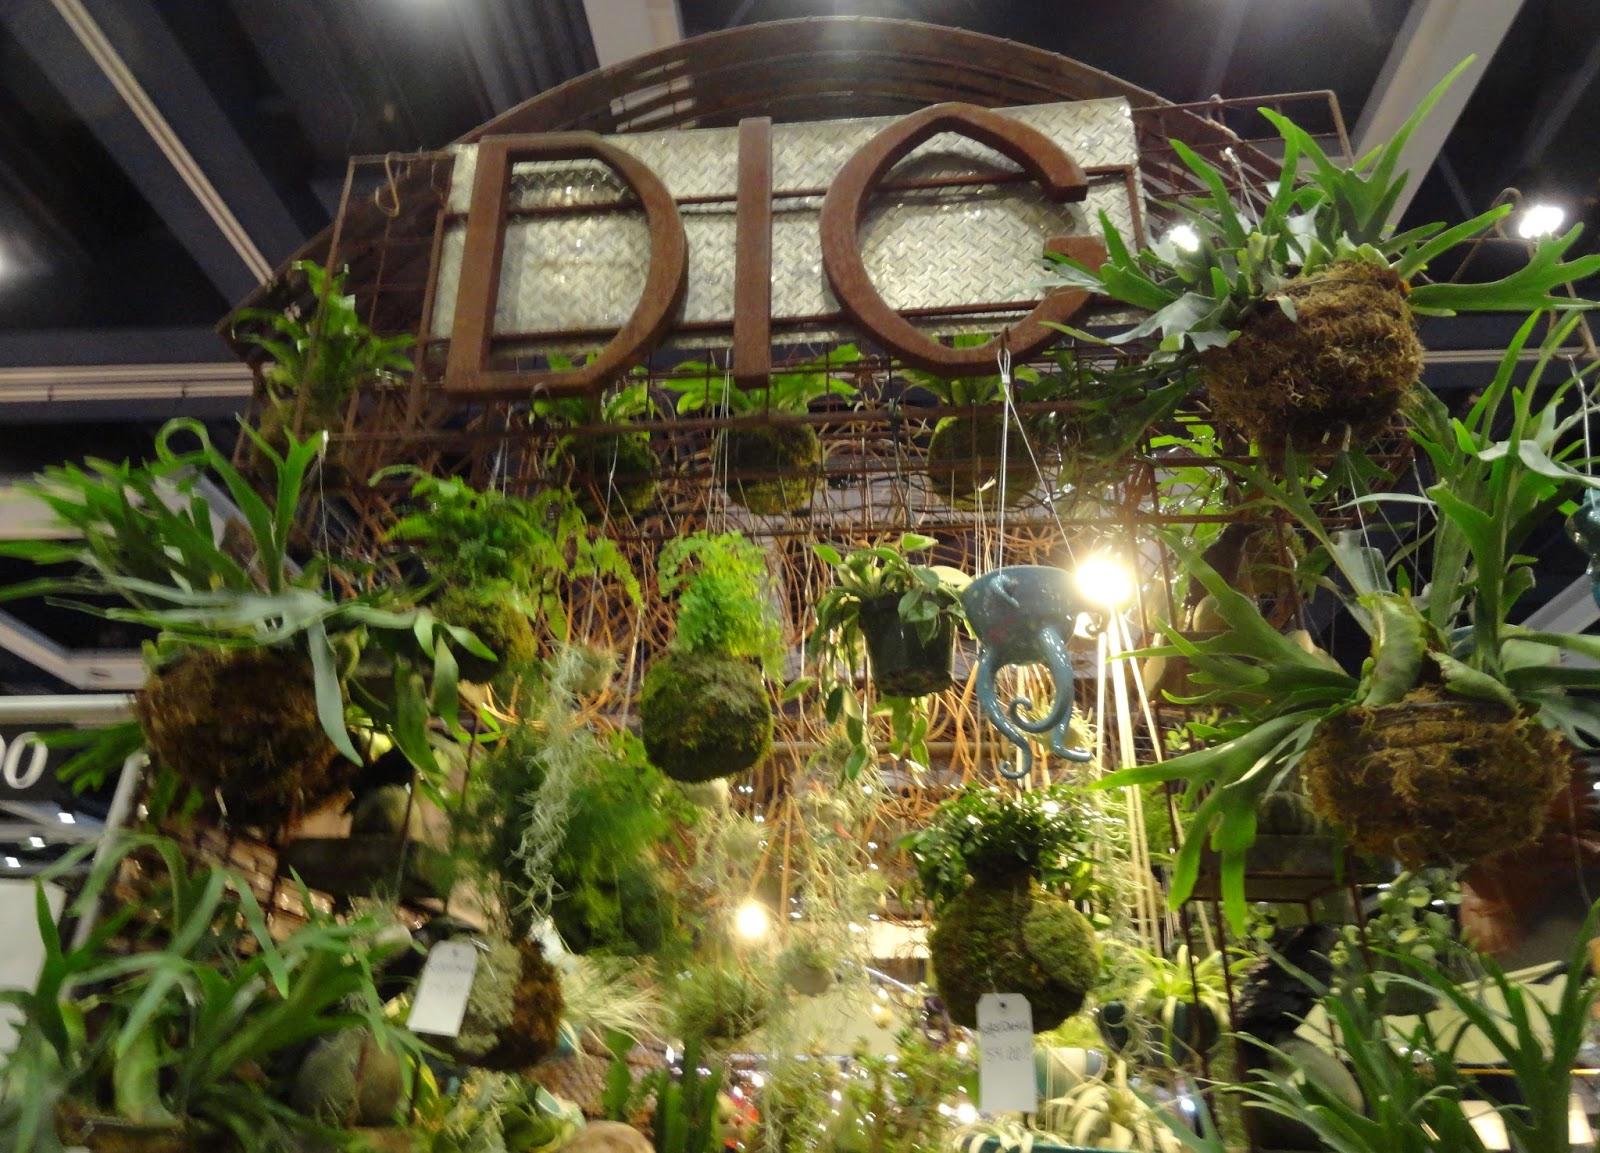 danger garden: NWFG Show, the vendors!